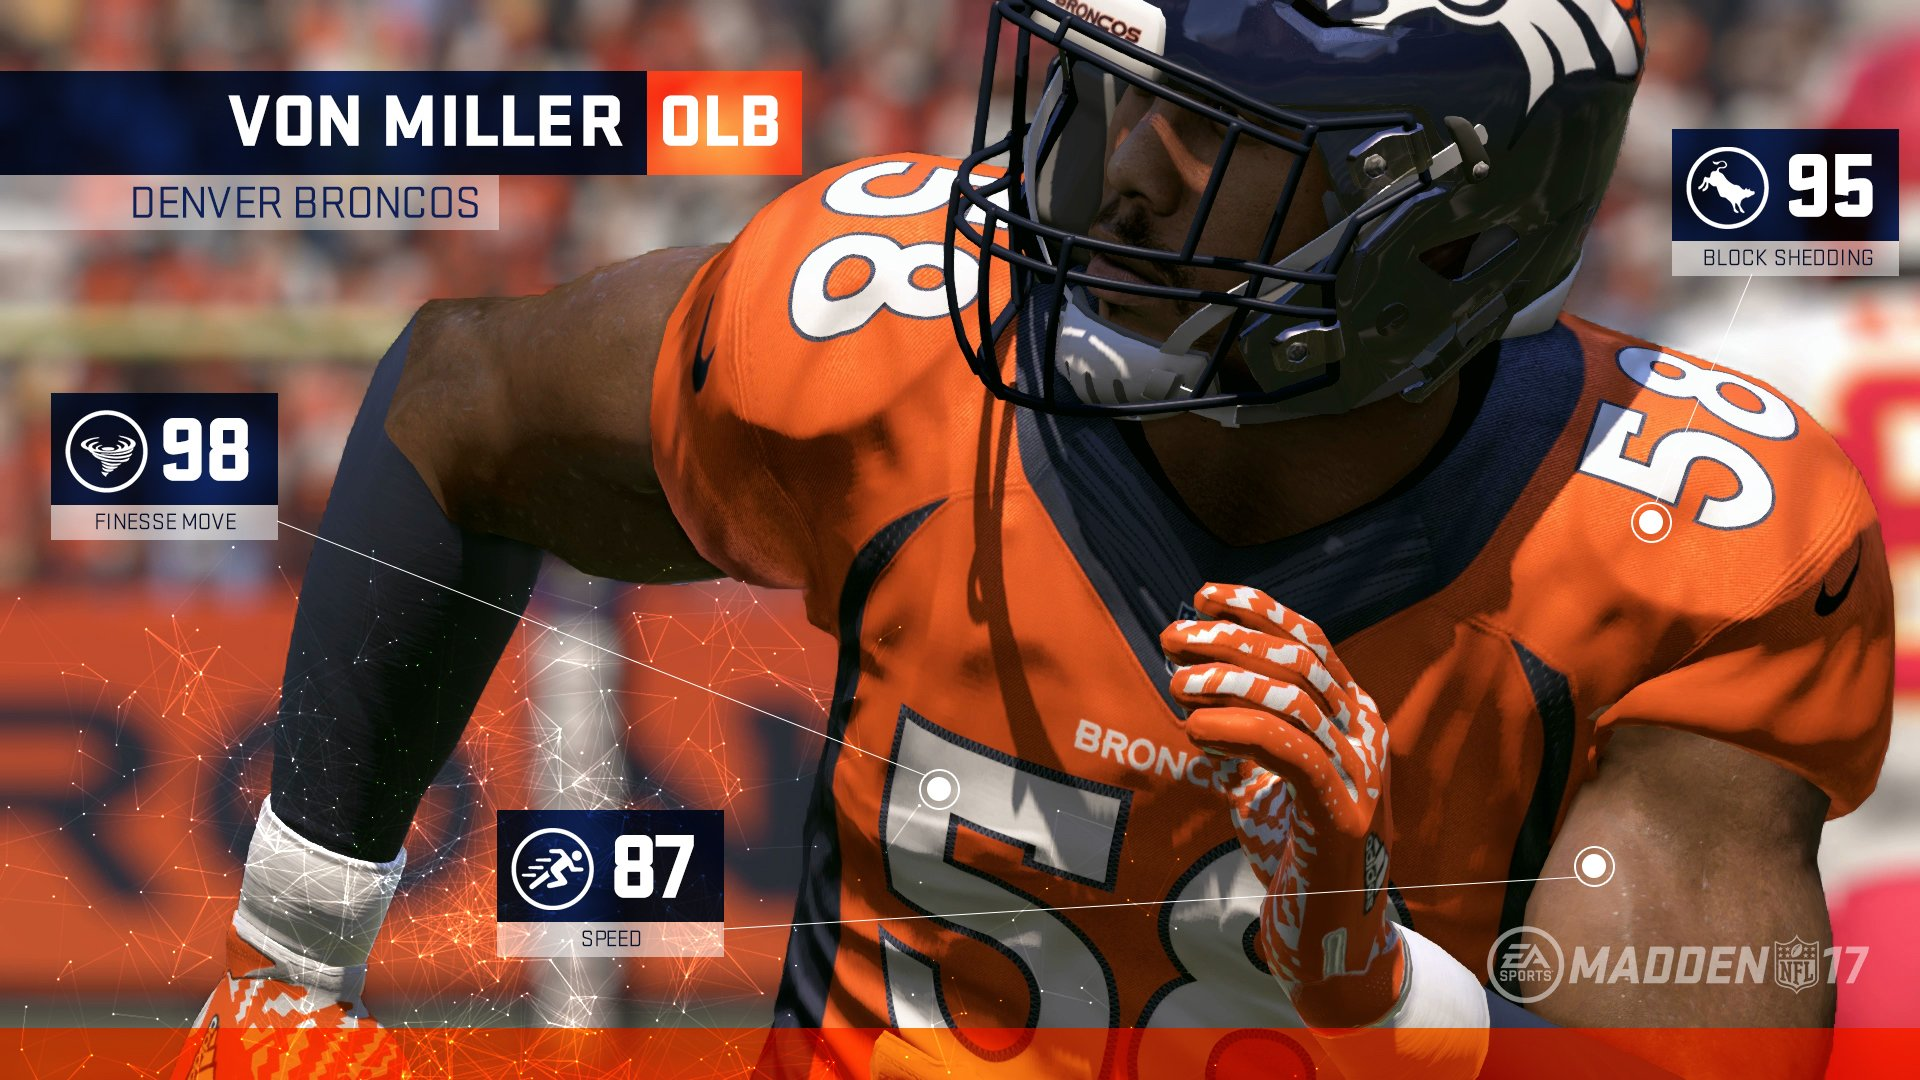 Madden NFL 17 Von Miller Ratings